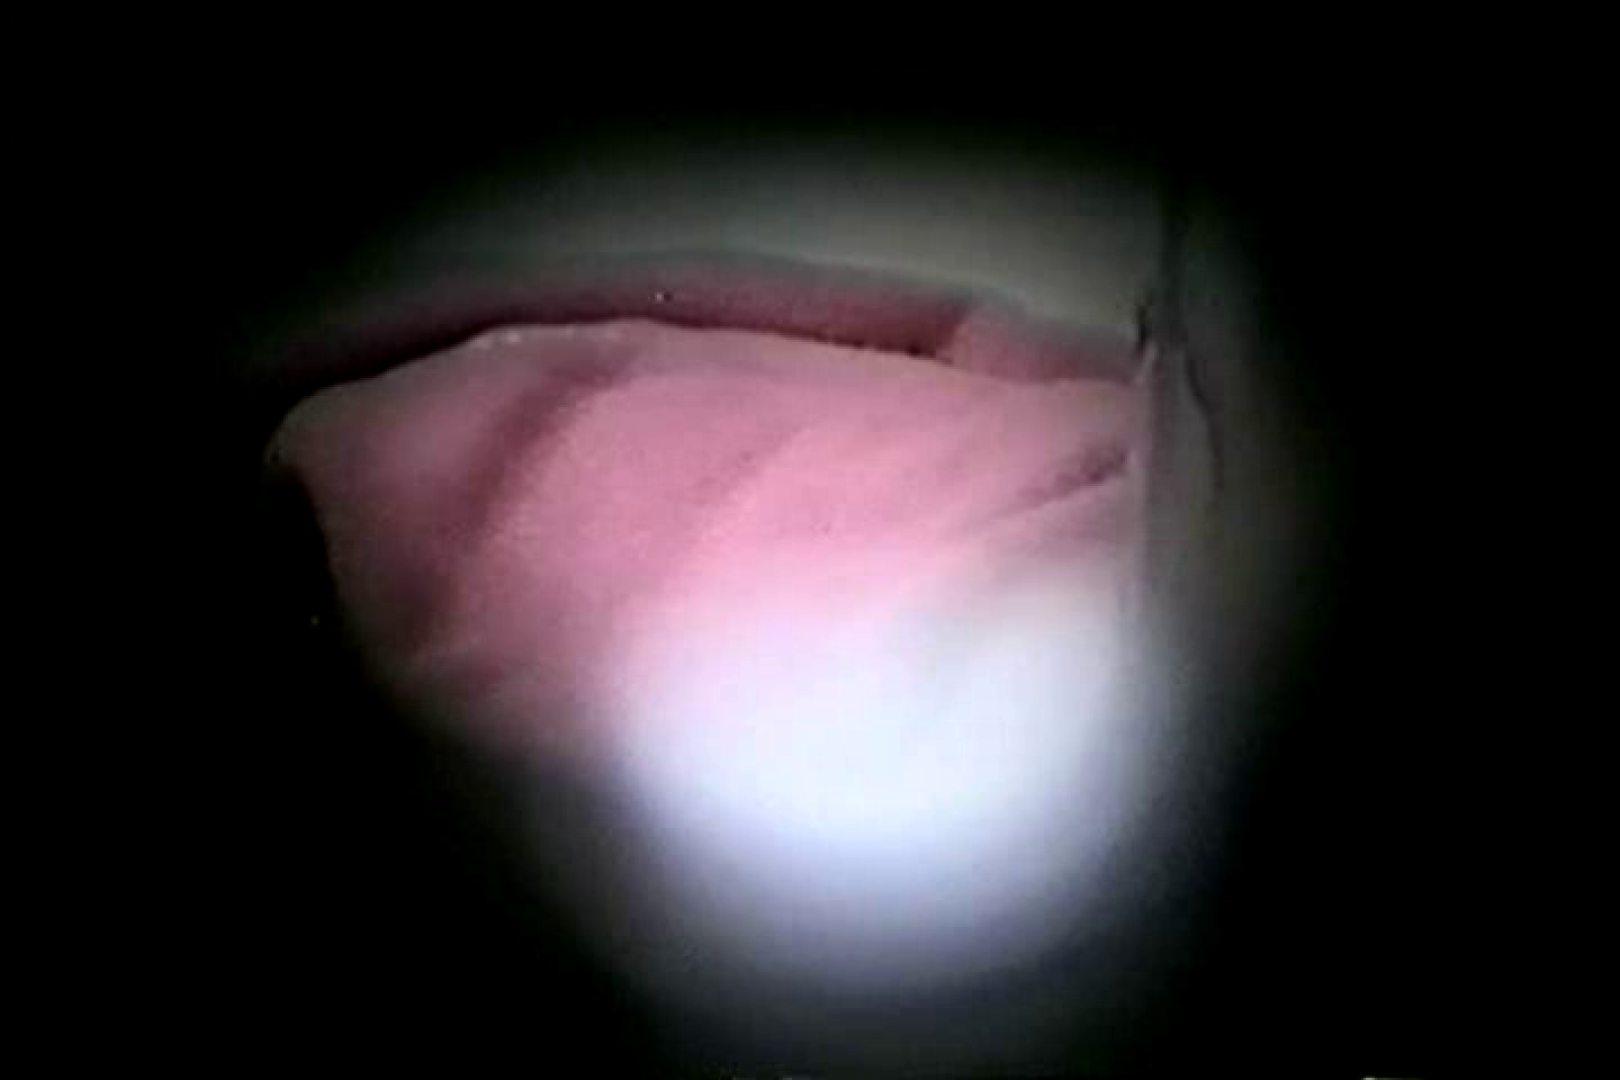 深夜の撮影会Vol.6 覗き 濡れ場動画紹介 109PIX 19